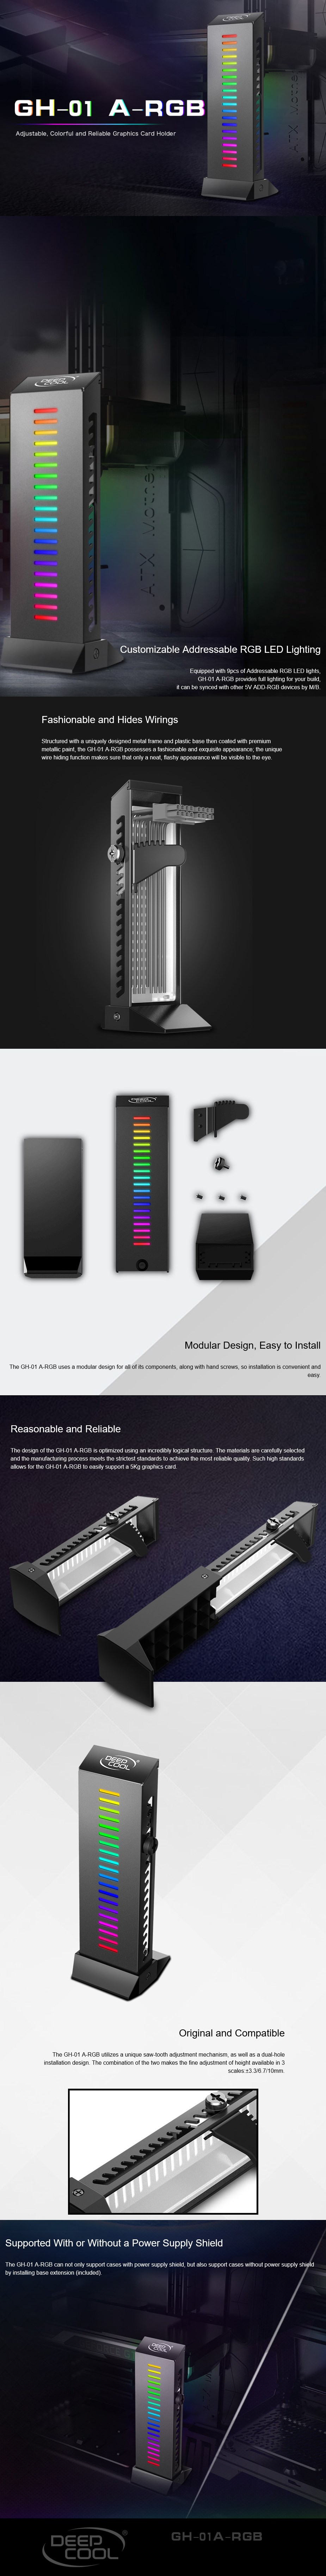 DeepCool GH-01 A-RGB Adjustable Internal Graphics Card Holder - Desktop Overview 1